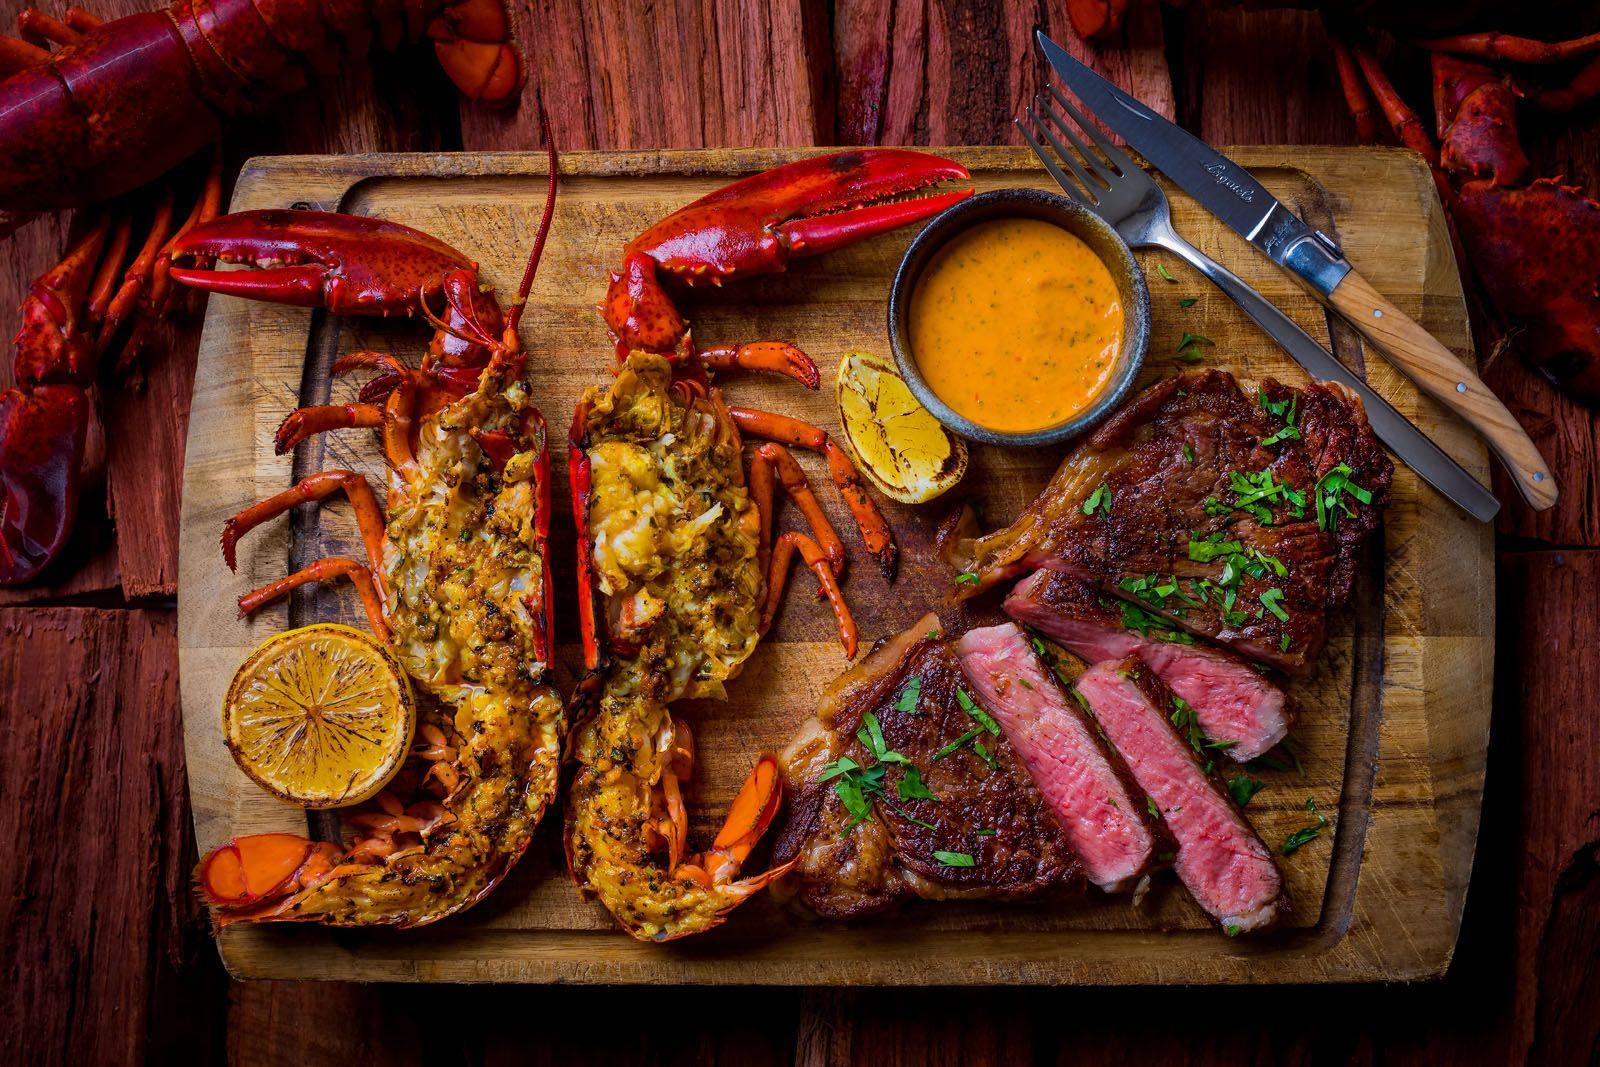 500g Westholme Wagyu & whole live Boston lobster